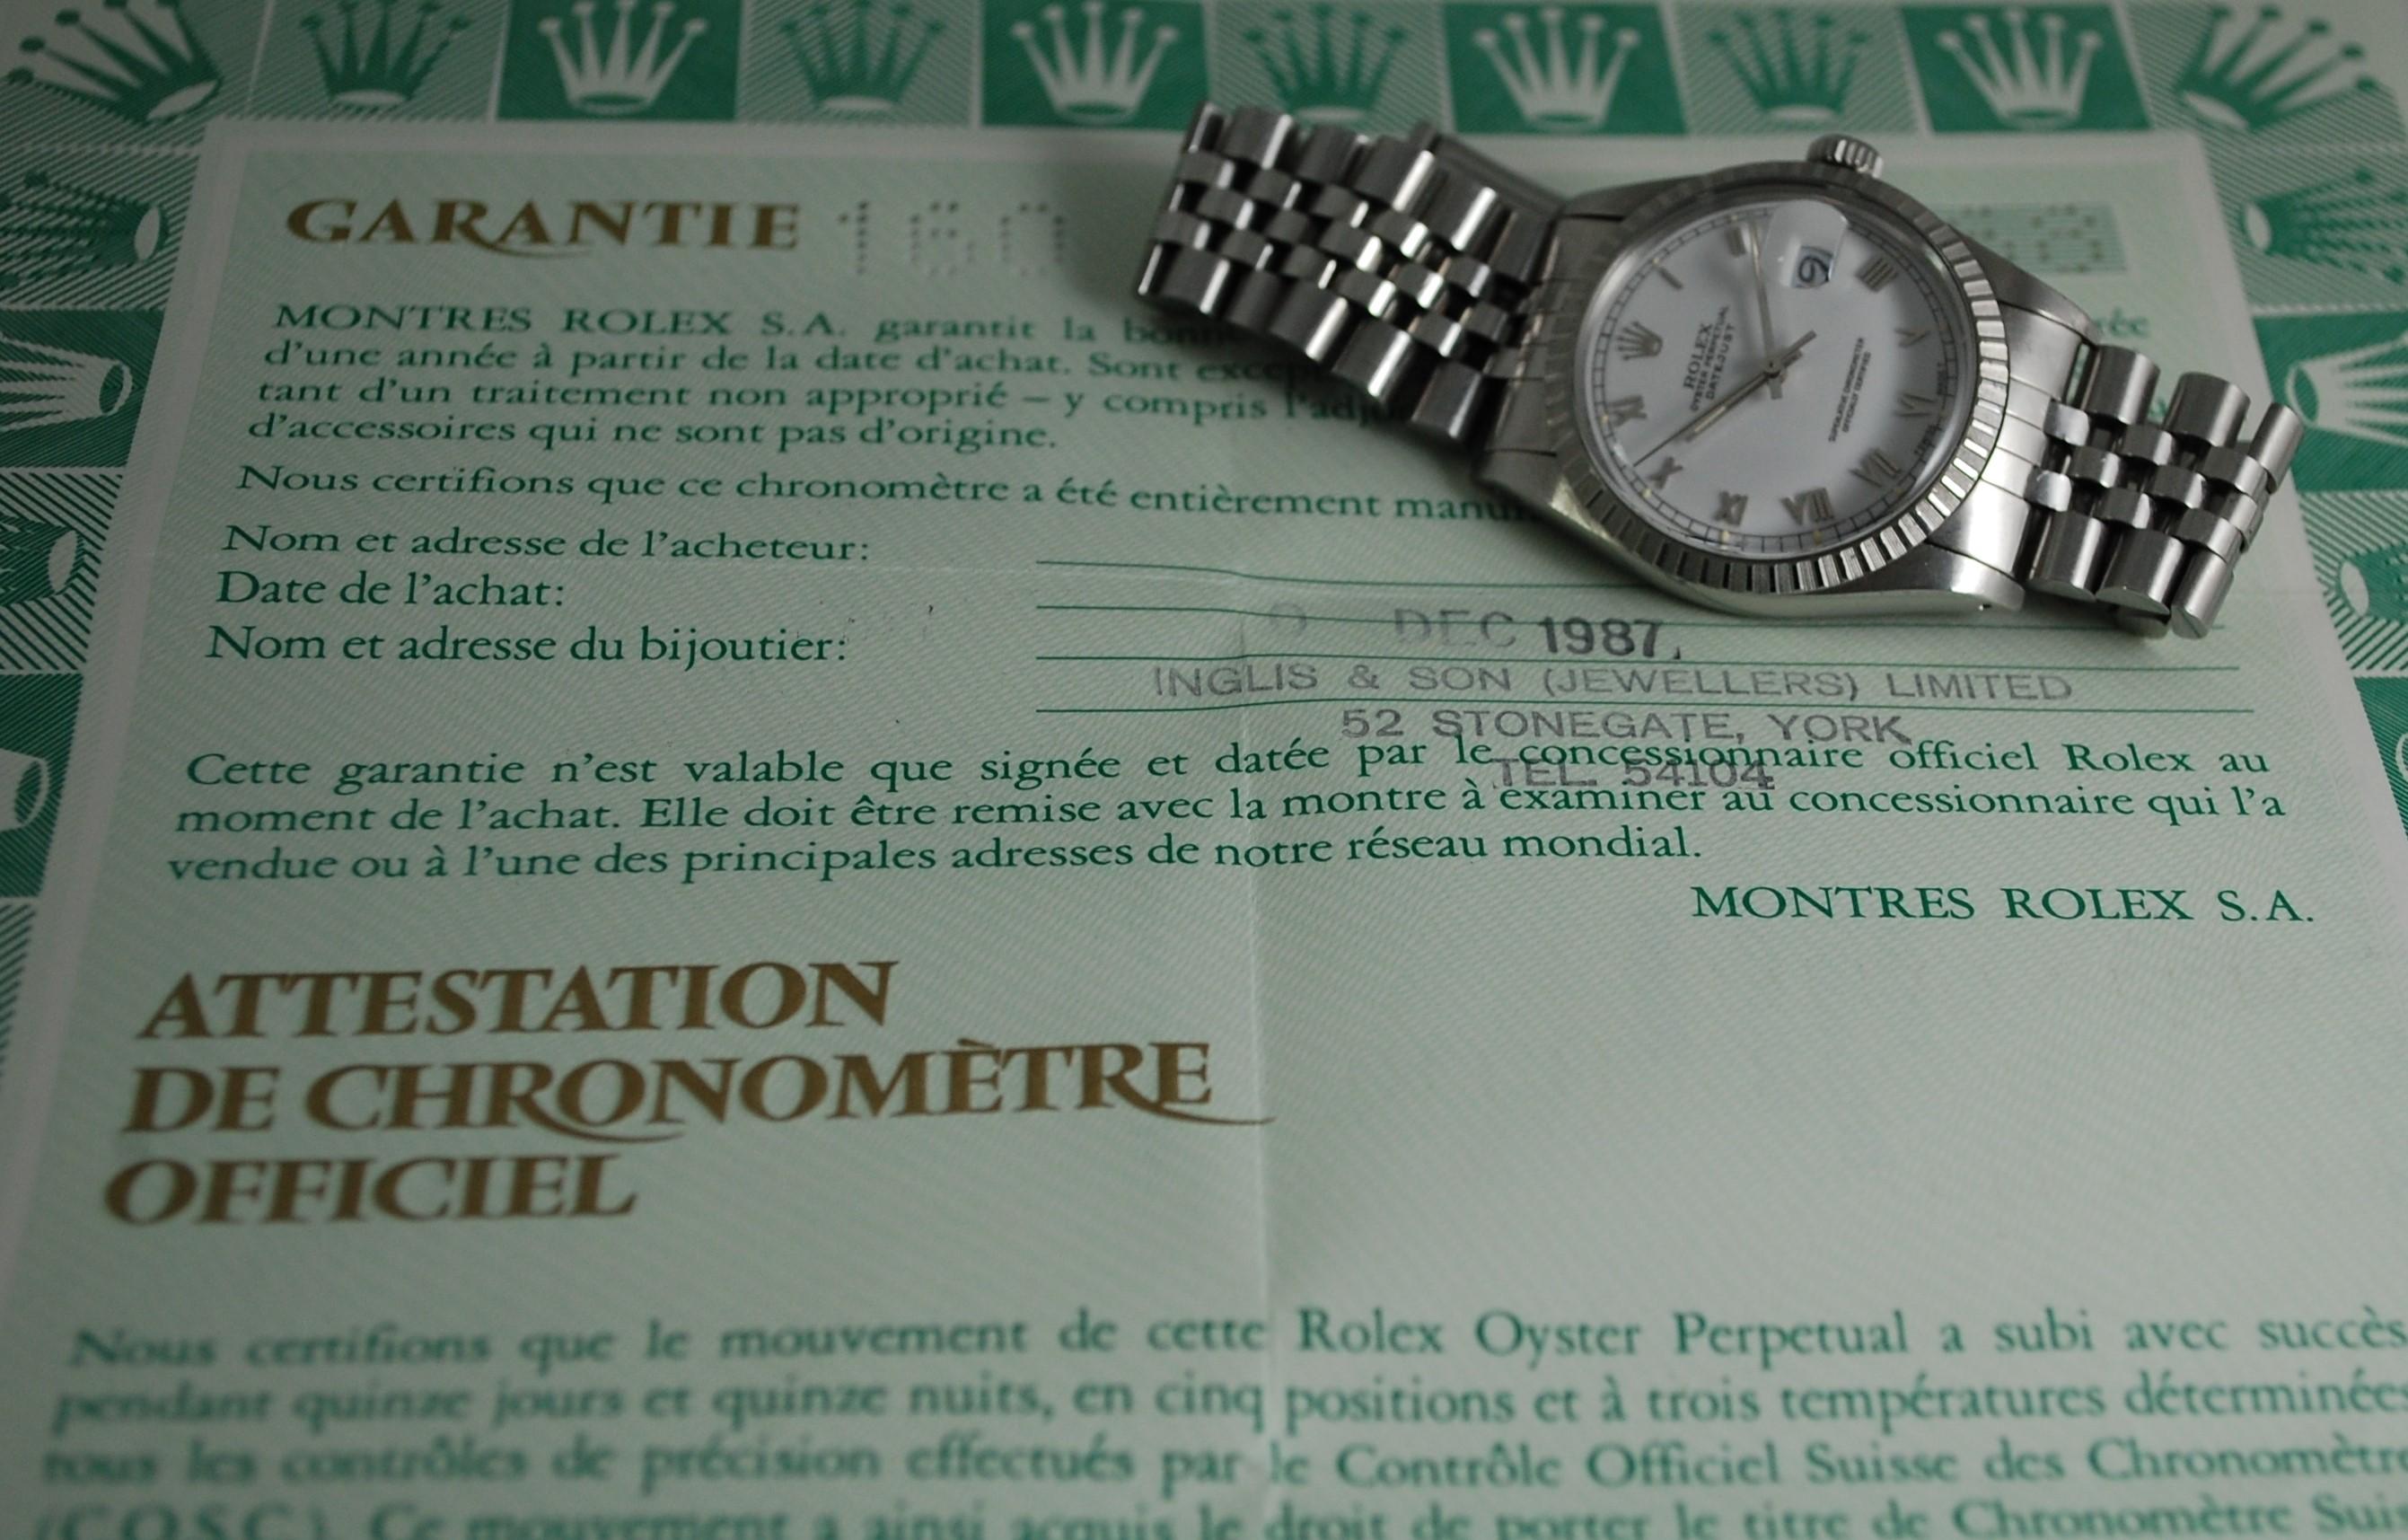 Rolex no serial number between lugs